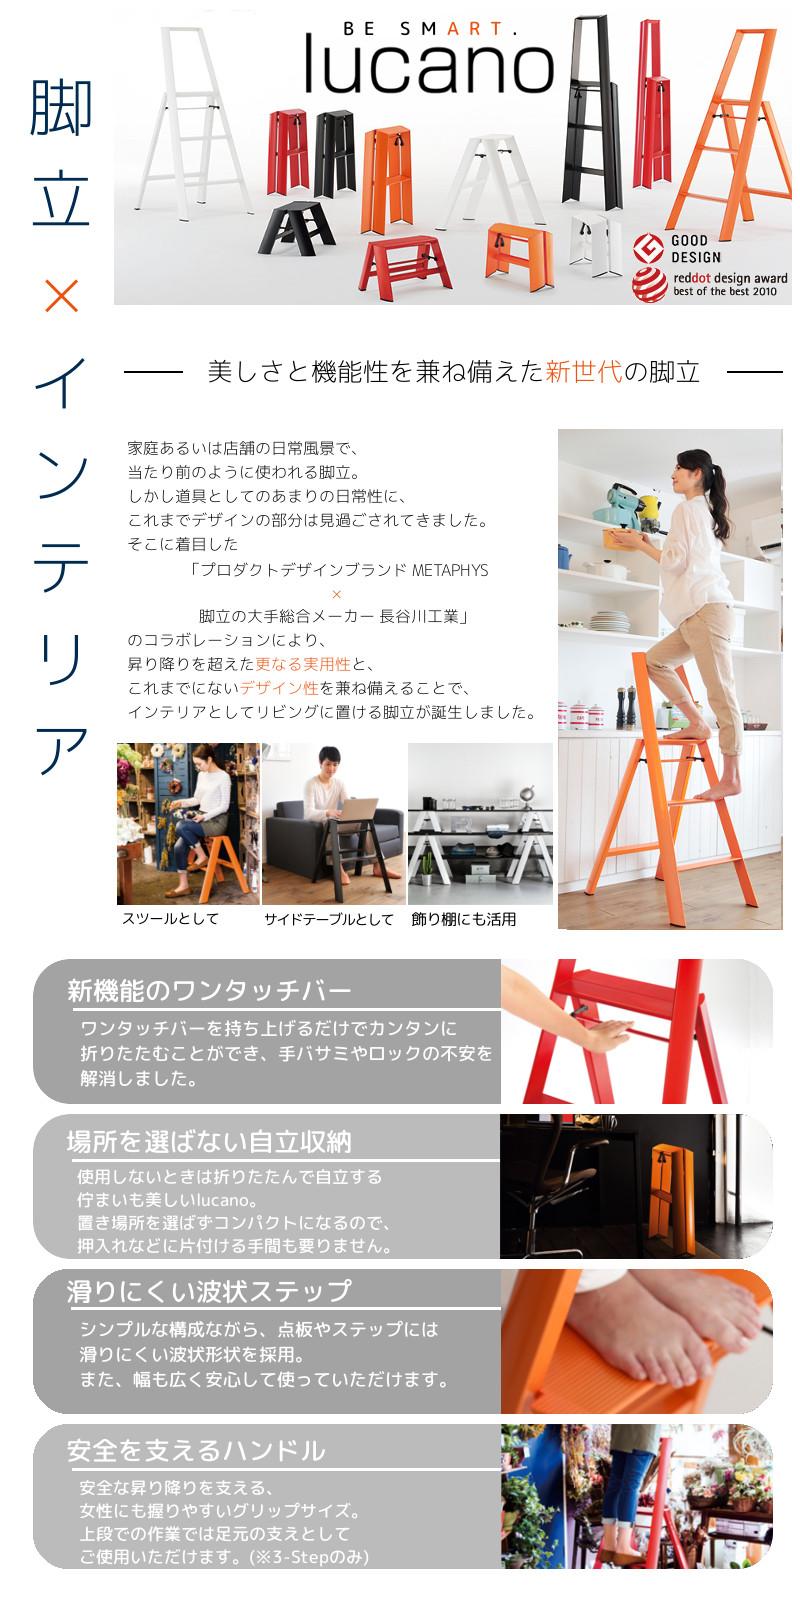 lucano 1-step Orange ルカーノ 1段 オレンジ 長谷川工業(HASEGAWA) ML1.0-1OR